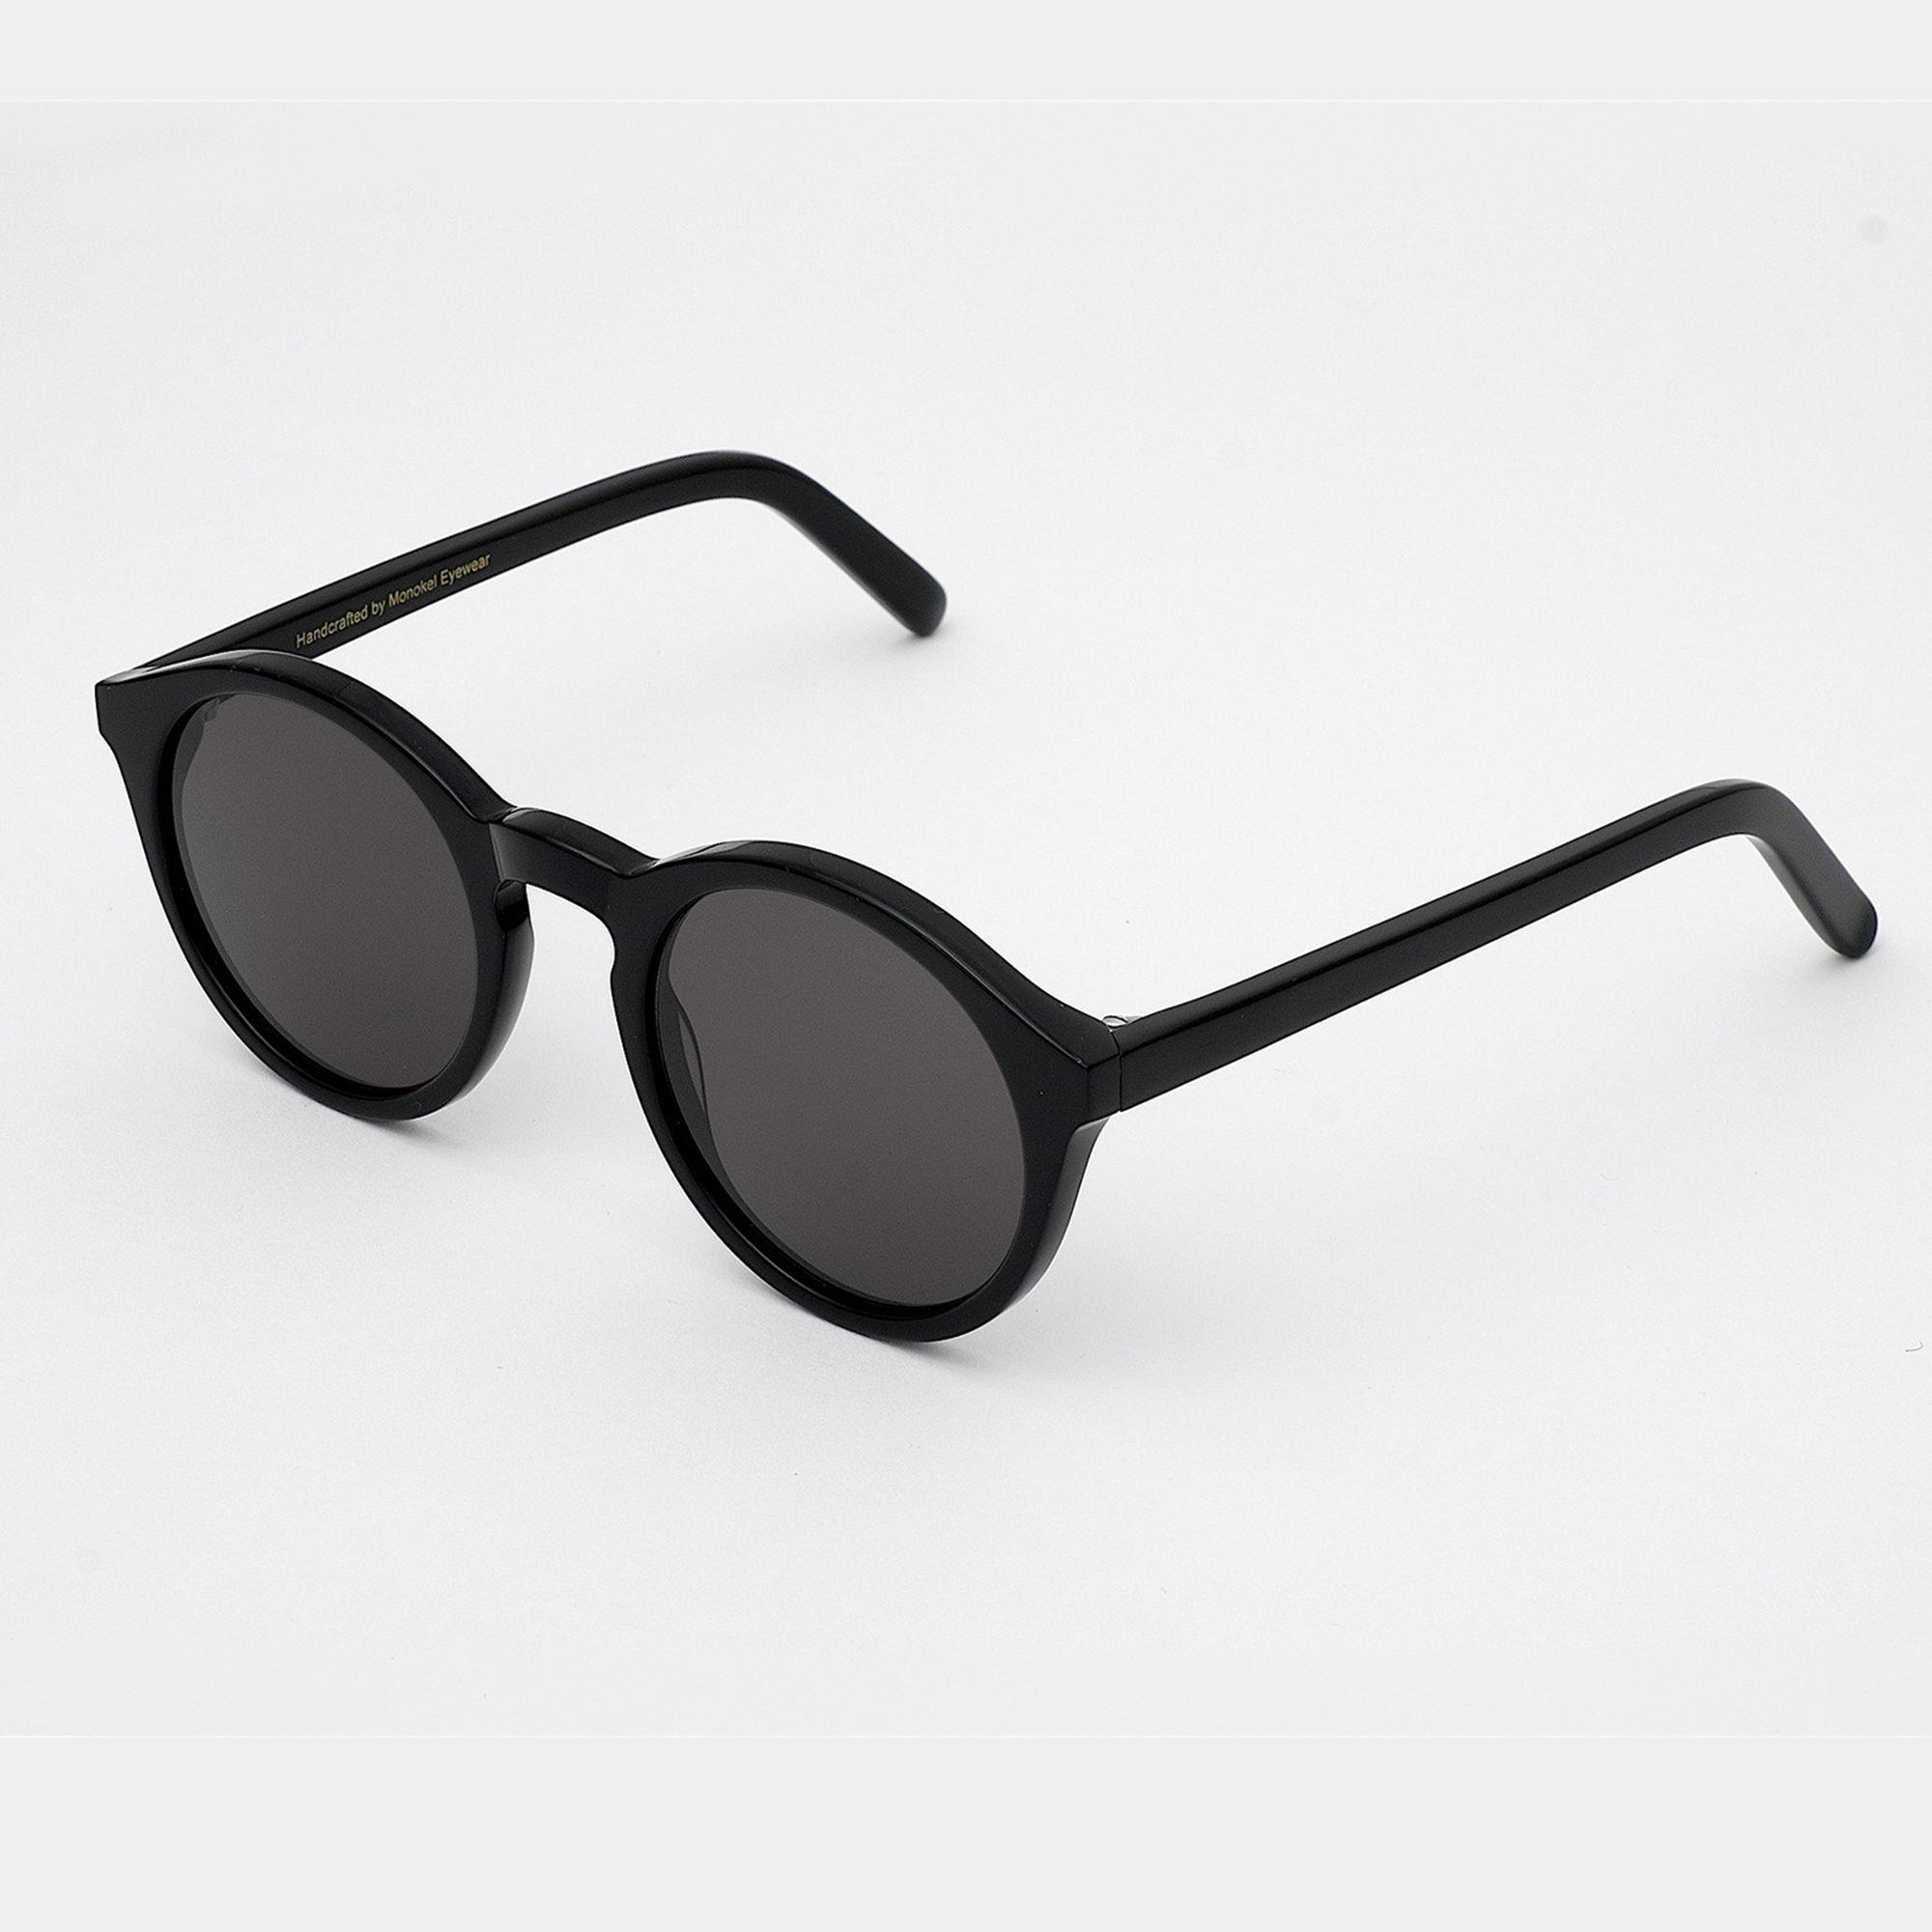 41e2a9ee591f5 Monokel Eyewear - Black Barstow Sunglasses for Men - Lyst. View fullscreen